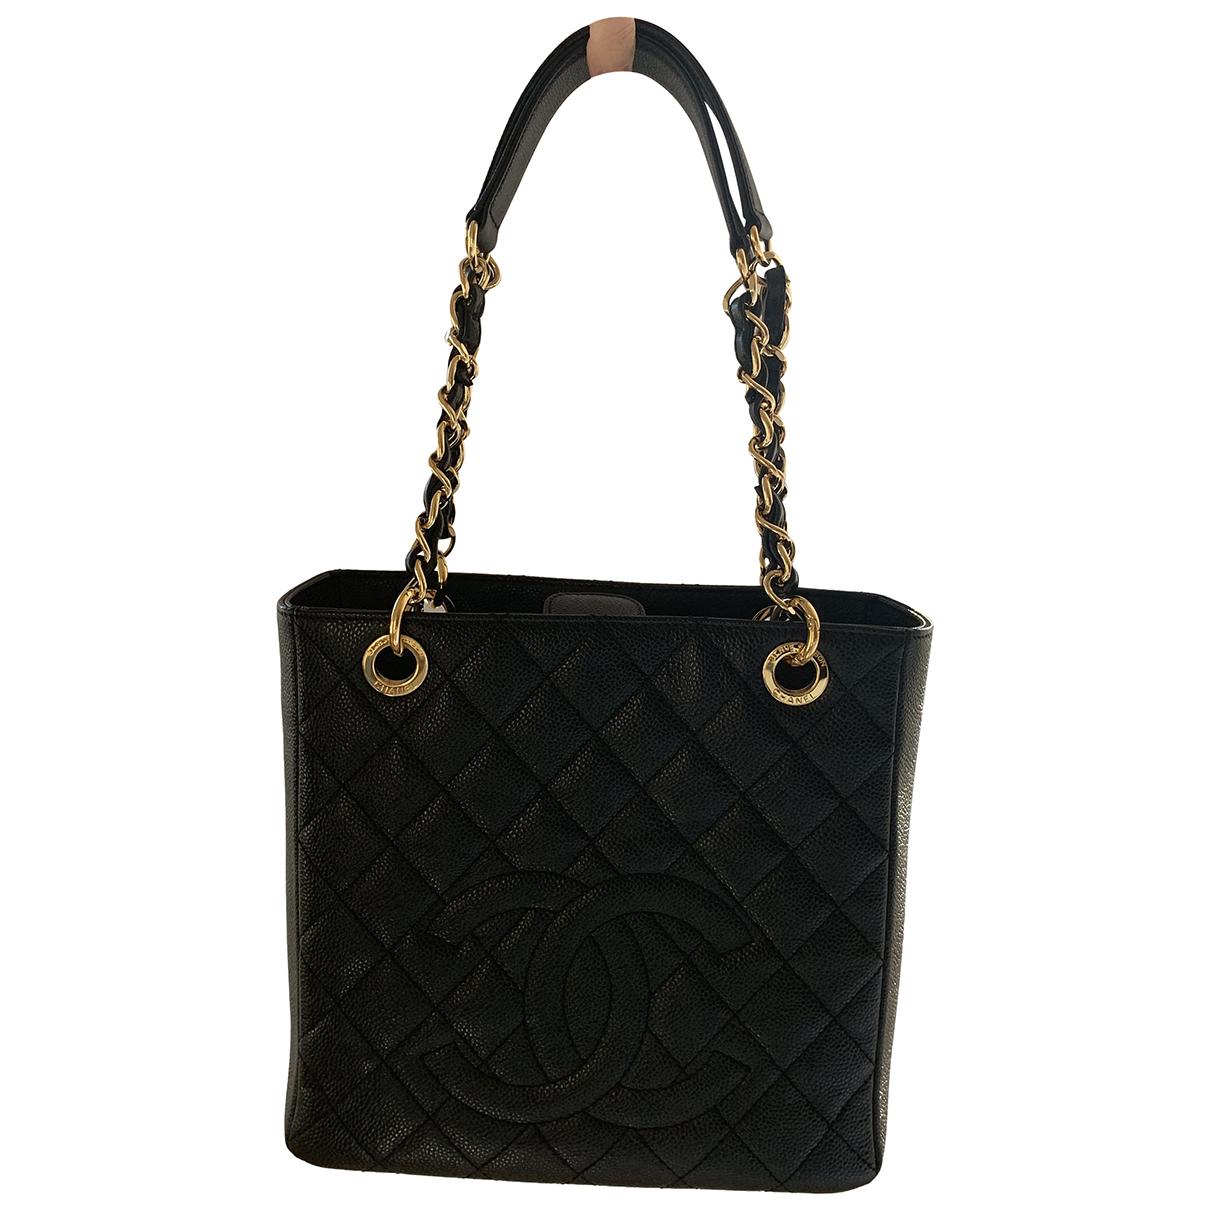 Chanel Petite Shopping Tote Black Leather handbag for Women N